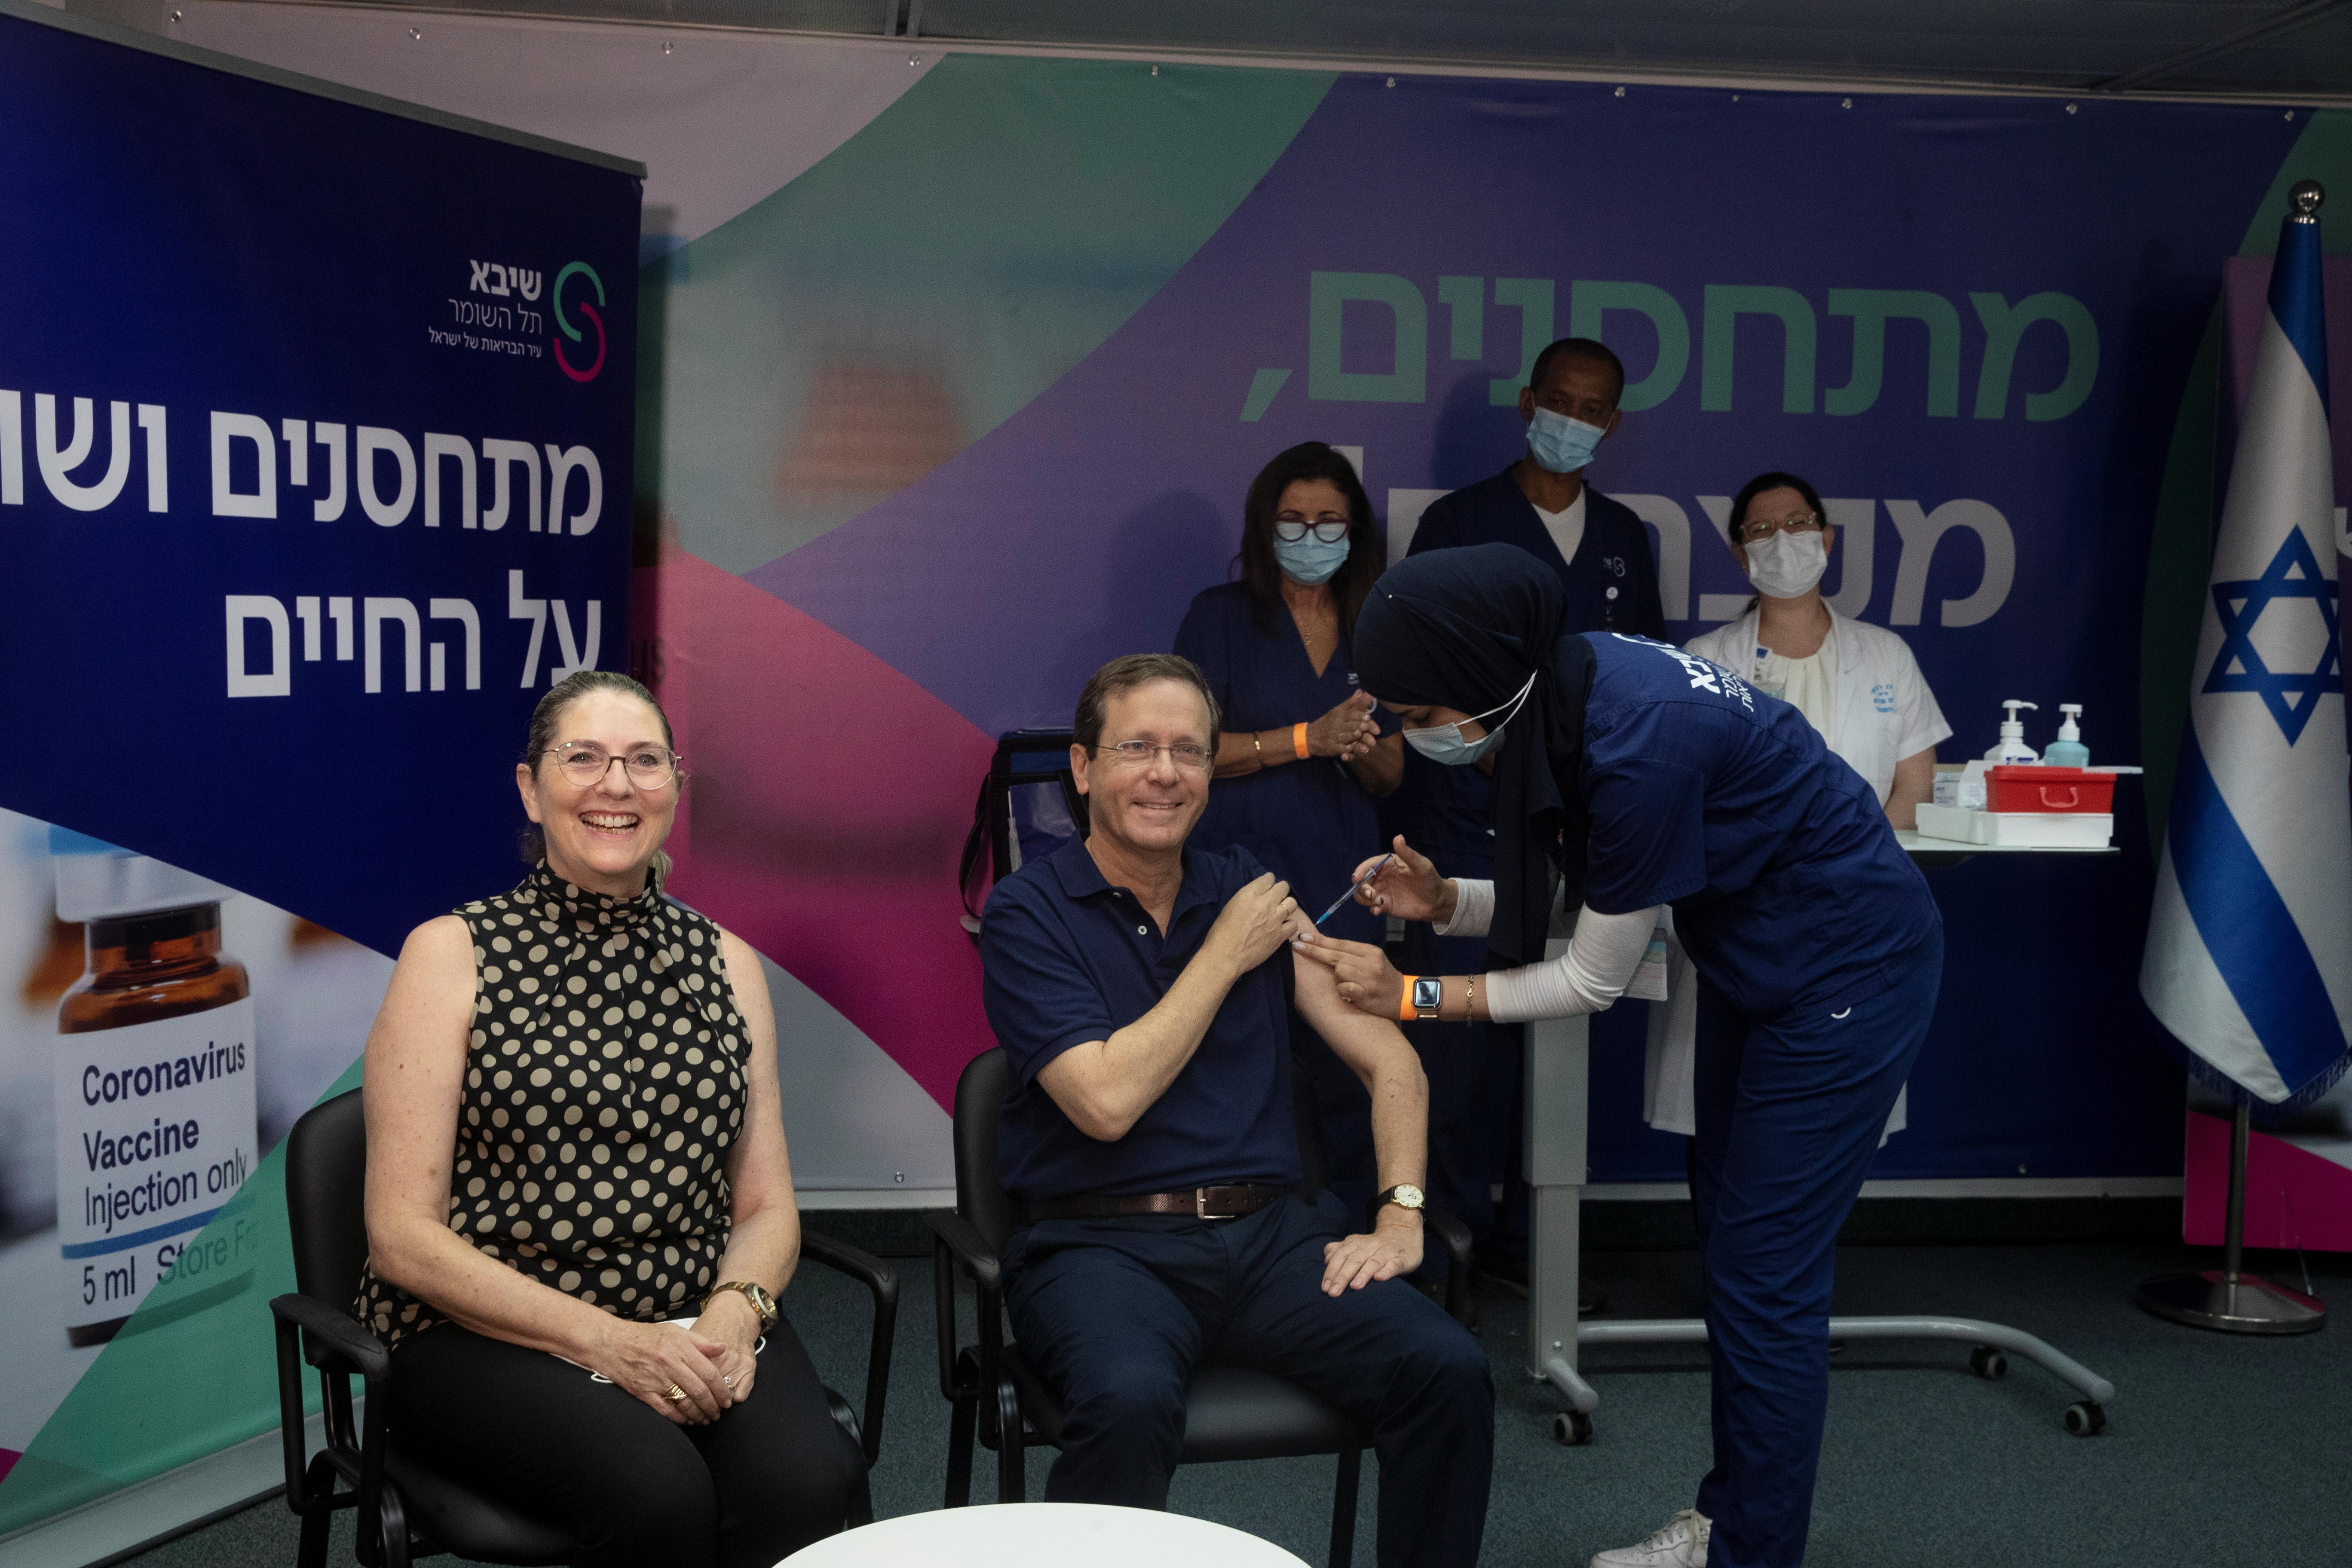 Israeli President Isaac Herzog receives a third dose of coronavirus disease (COVID-19) vaccine while his wife, Michal, reacts, at Sheba Medical Center in Ramat Gan, Israel, July 30, 2021. Maya Alleruzzo/Pool via REUTERS